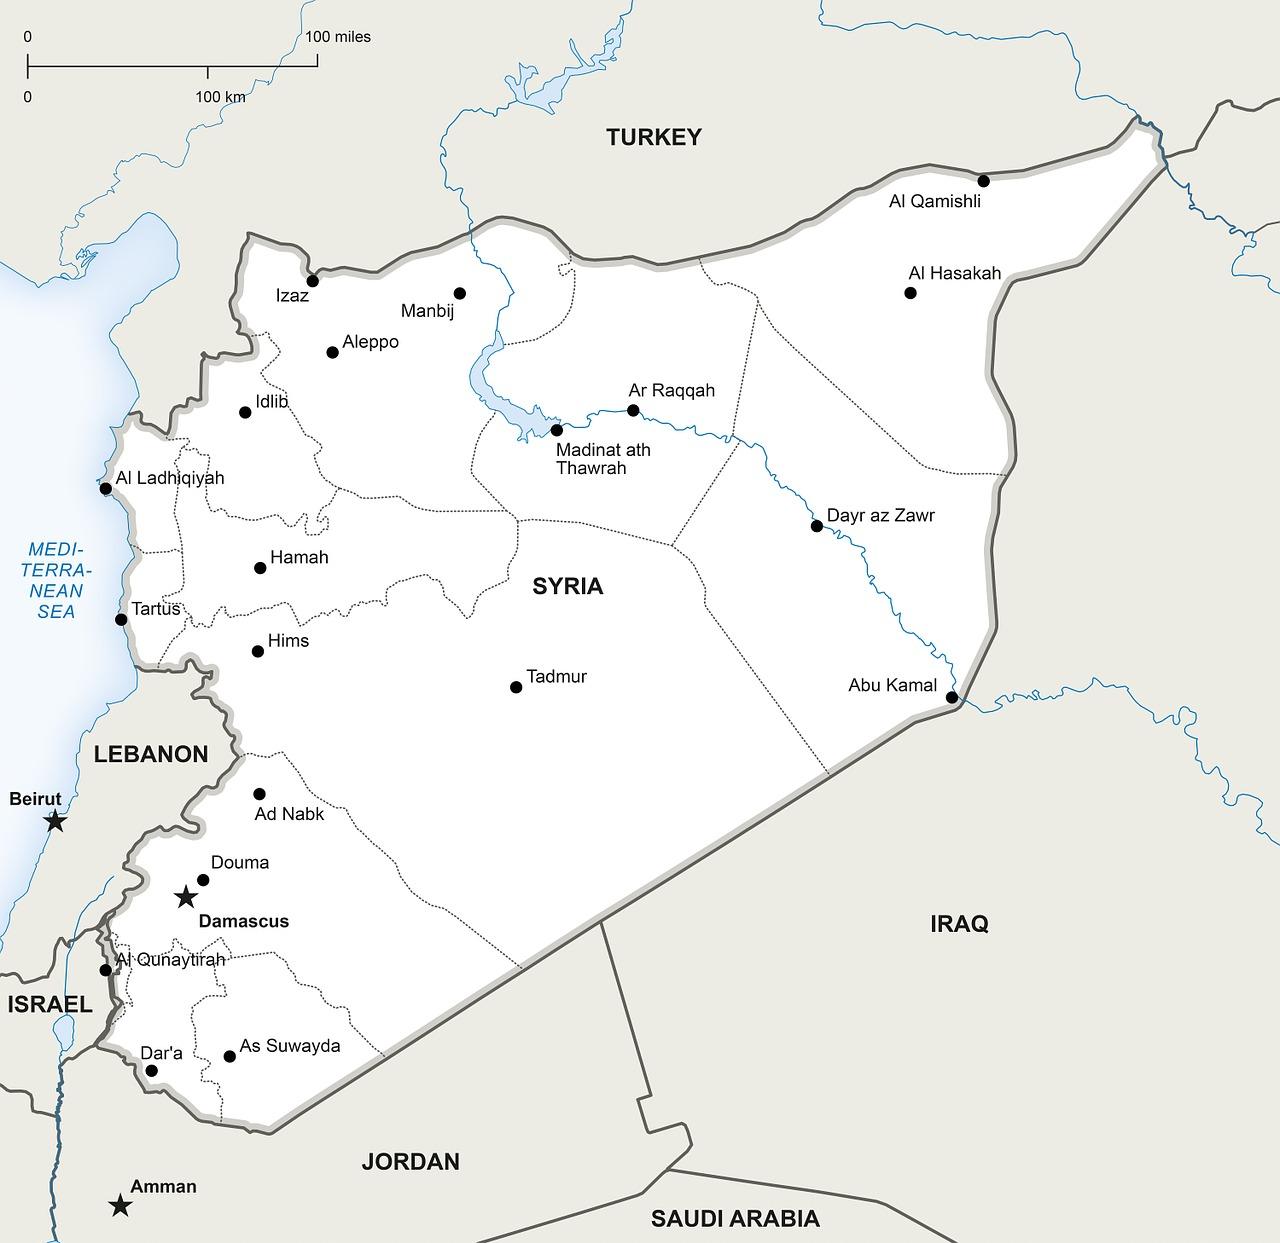 NATO-Angriff auf Syrien?